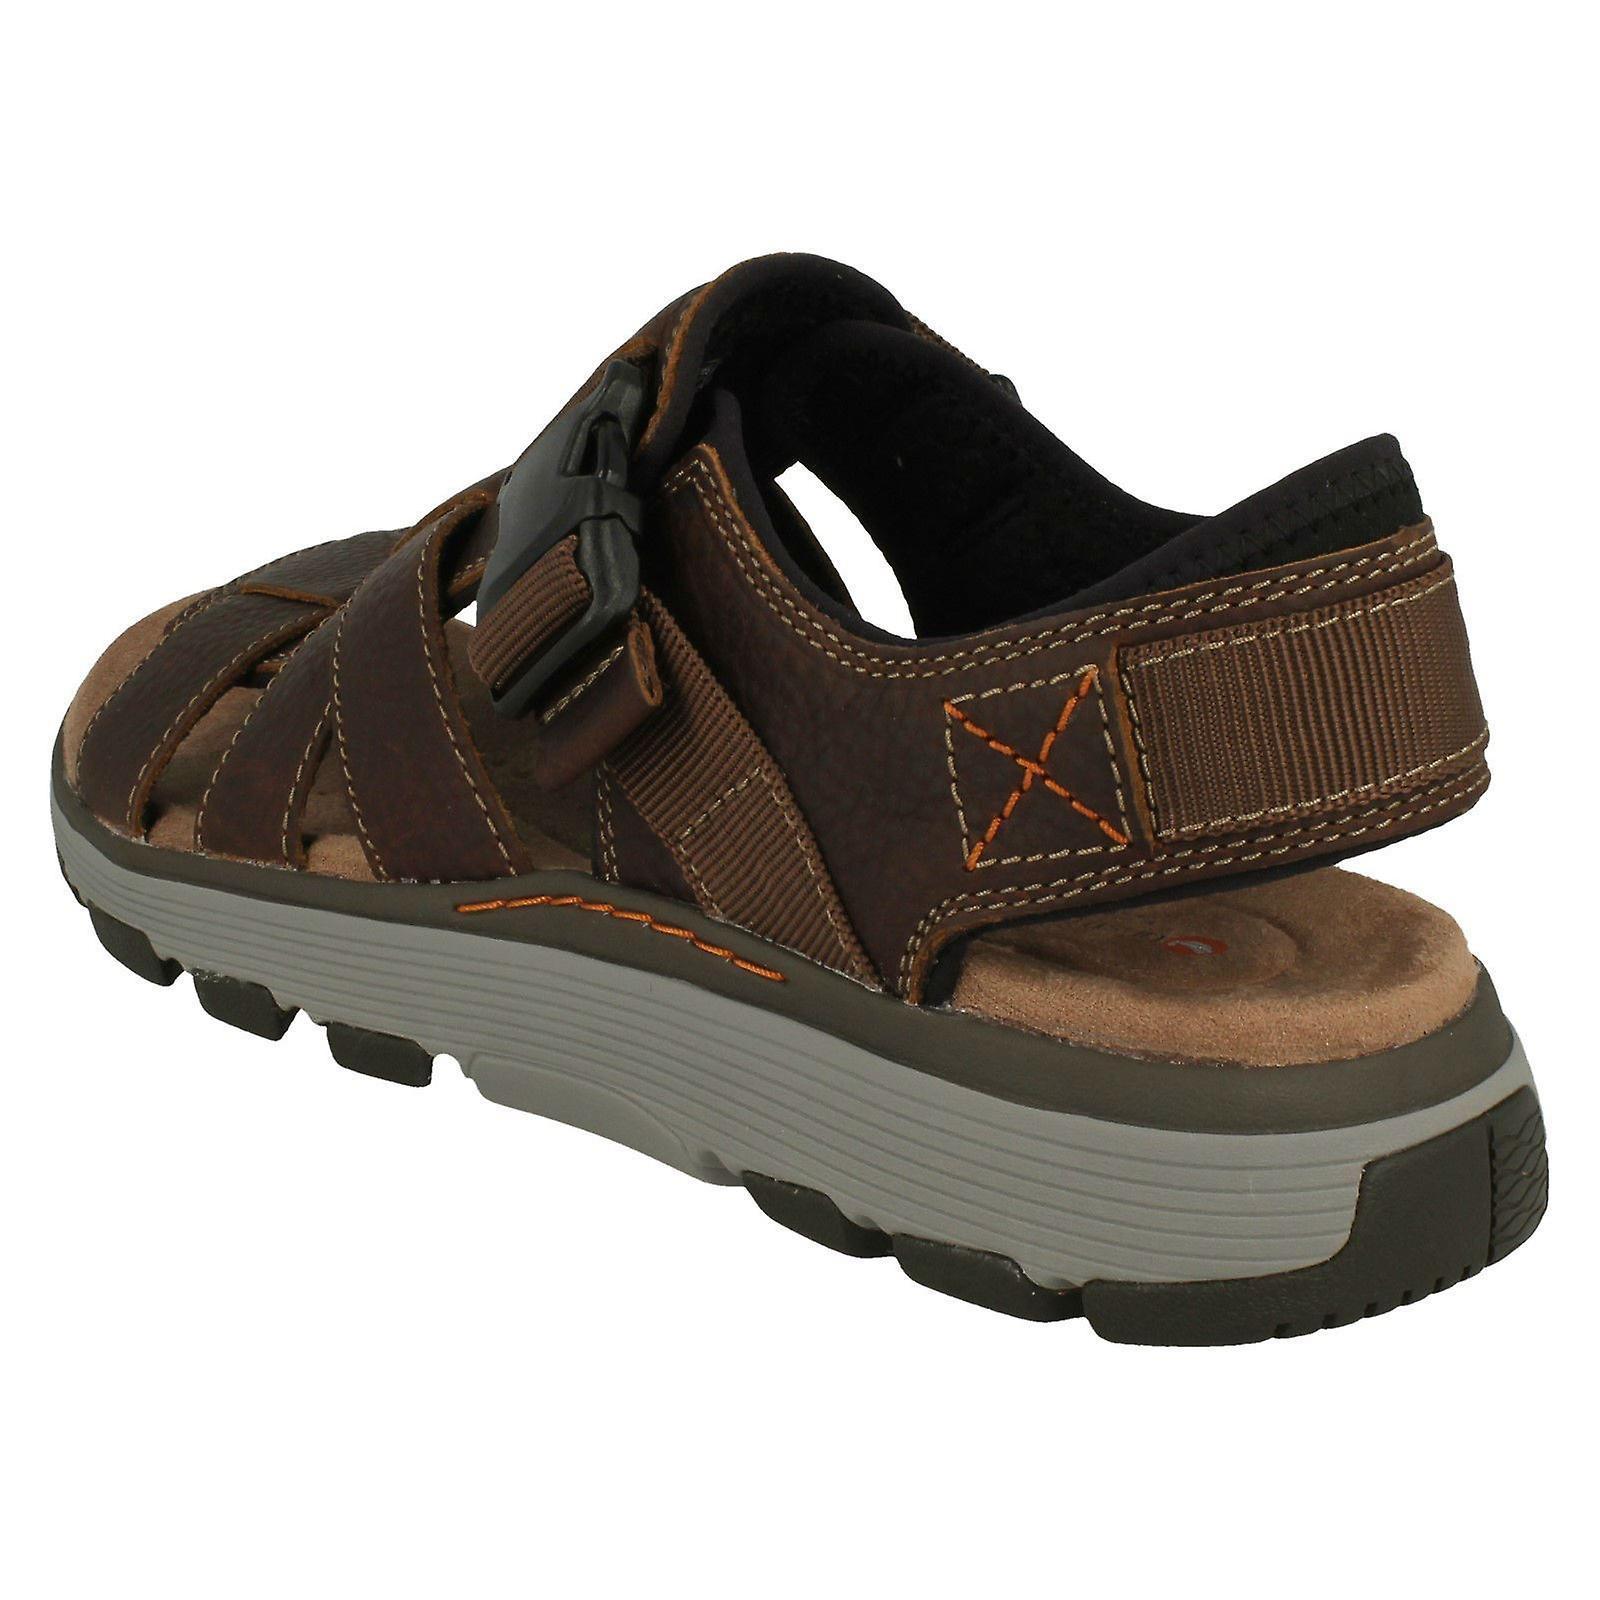 3e89cbd28360 Mens Clarks Casual Strapped Sandals Un Trek Cove - Dark Tan Leather - UK  Size 7.5